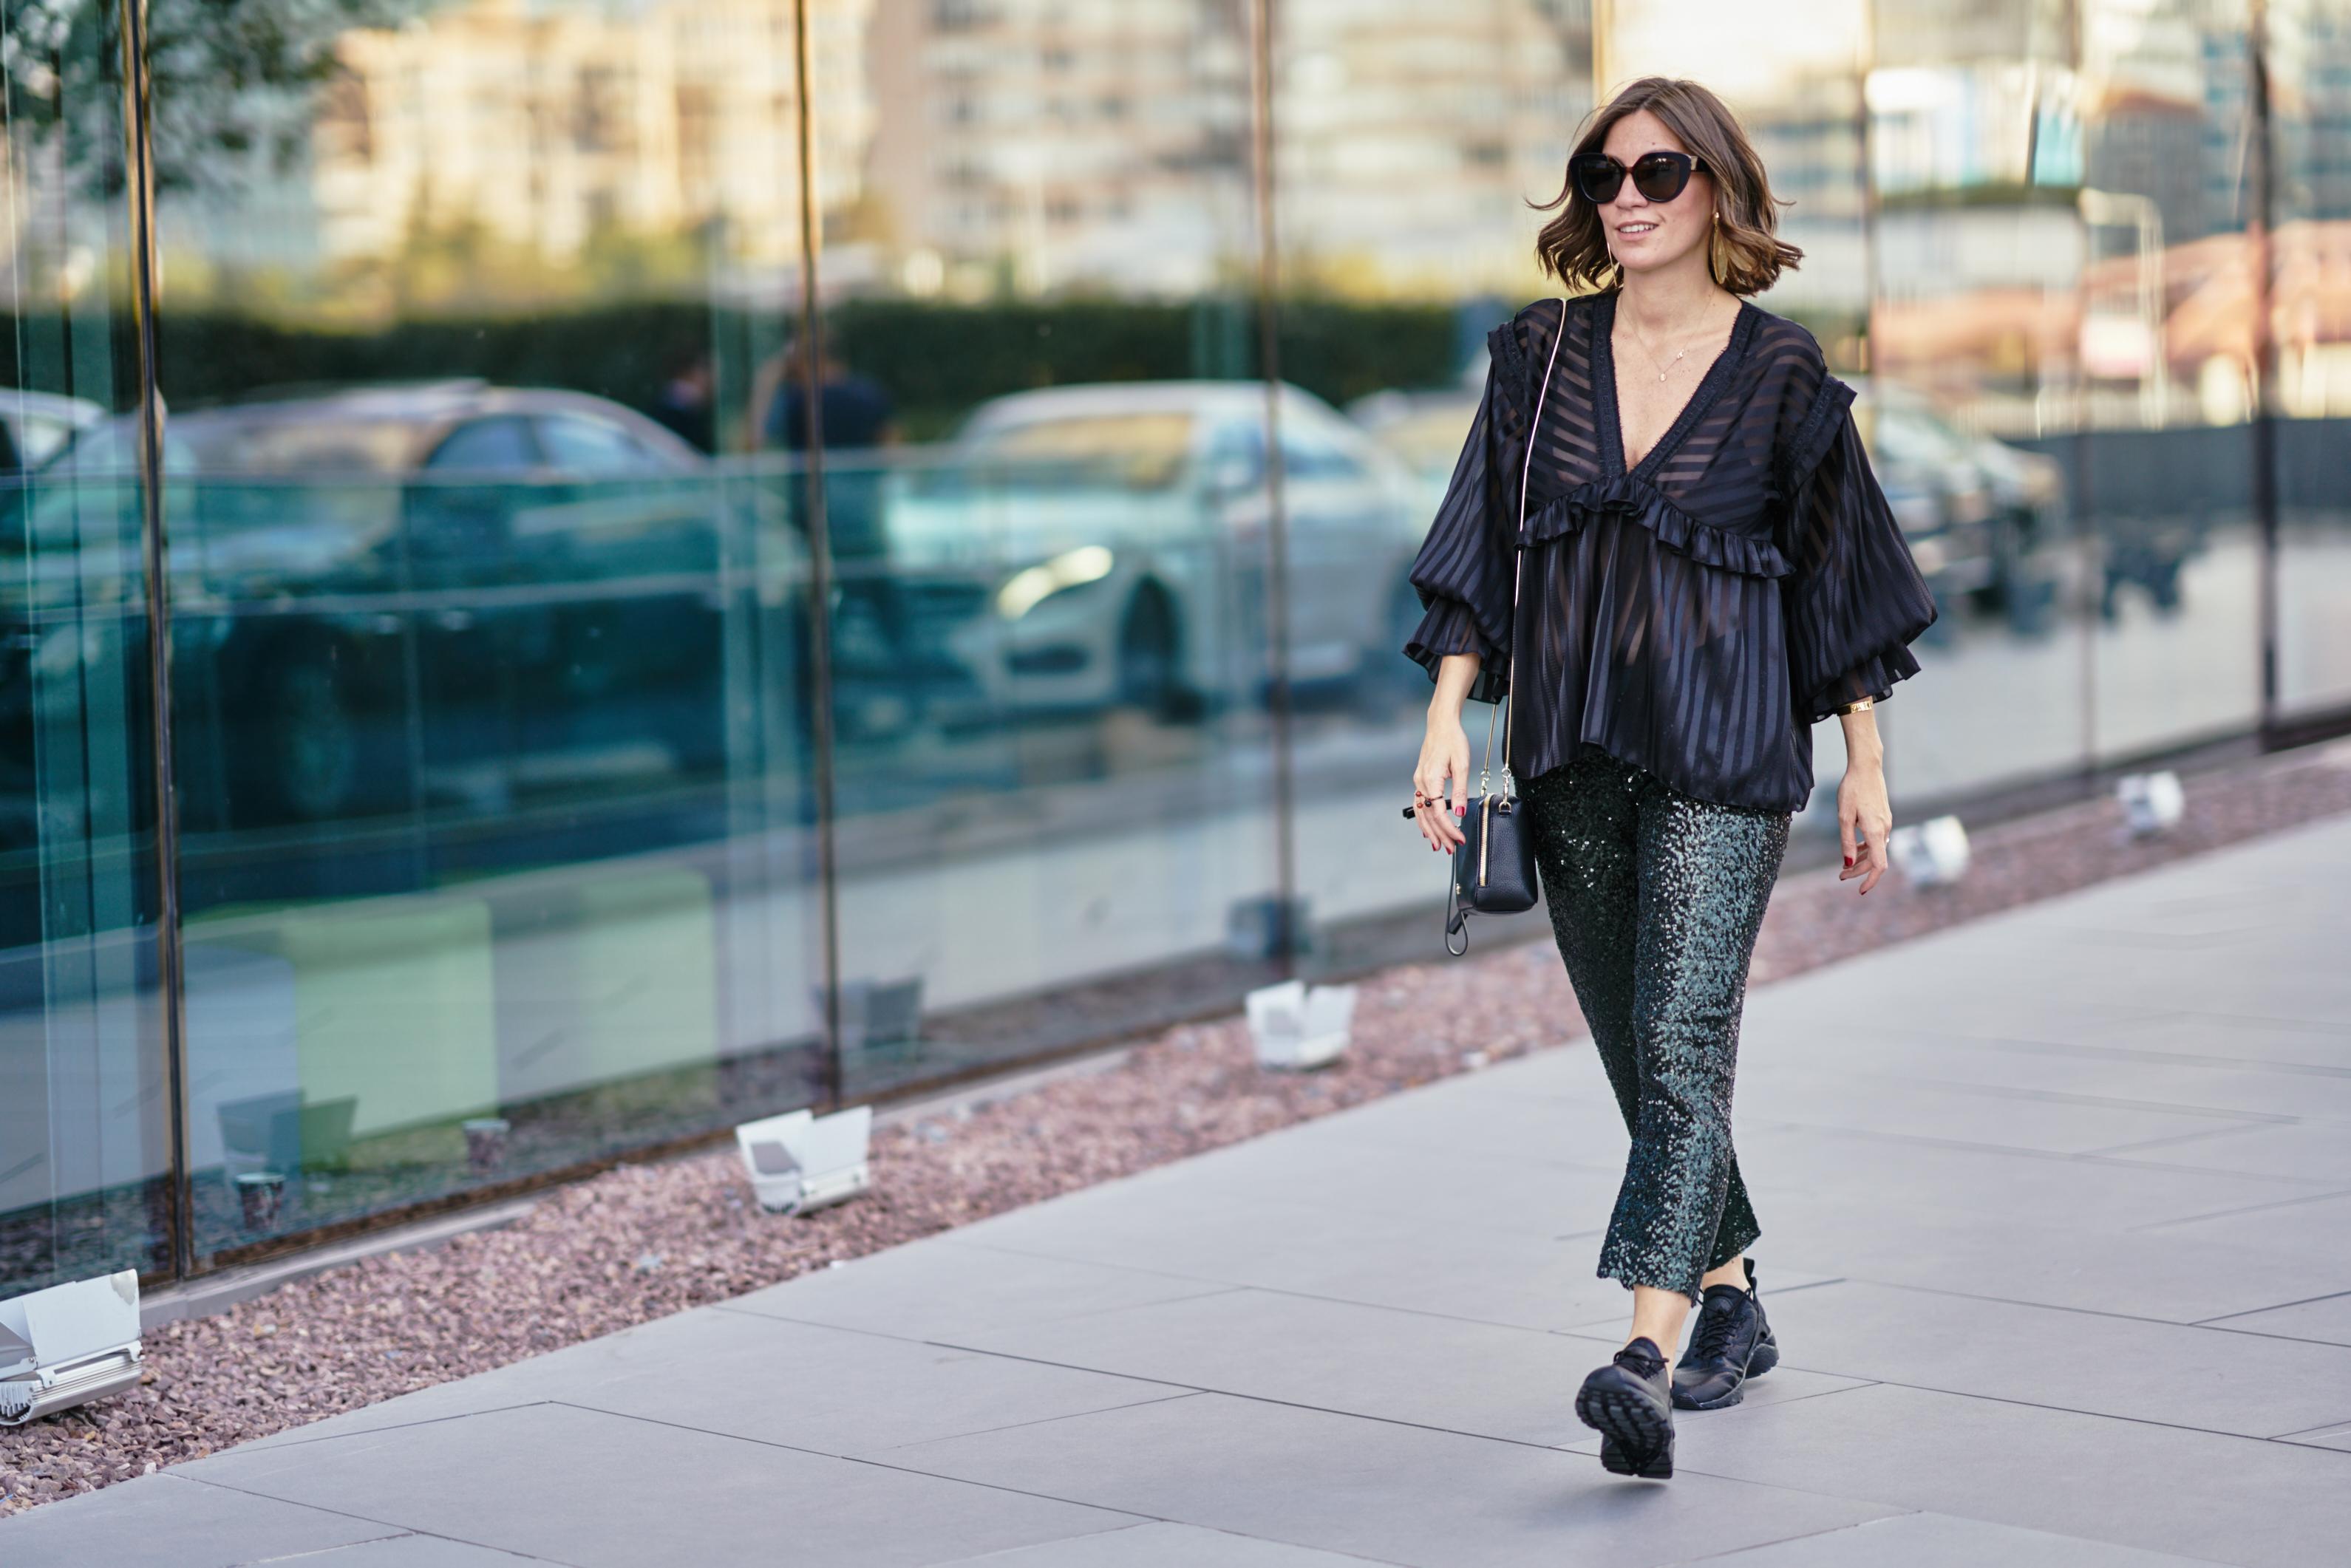 billur saatci, offnegiysem, street style, turkish style blogger, mbfwi, mercedes-benz fashion week istanbul, istanbul moda haftası, ne giydim, ootd, fey, nike huarache, marni, lug von siga, aigner, uterque, nike women, ntc, hekayat